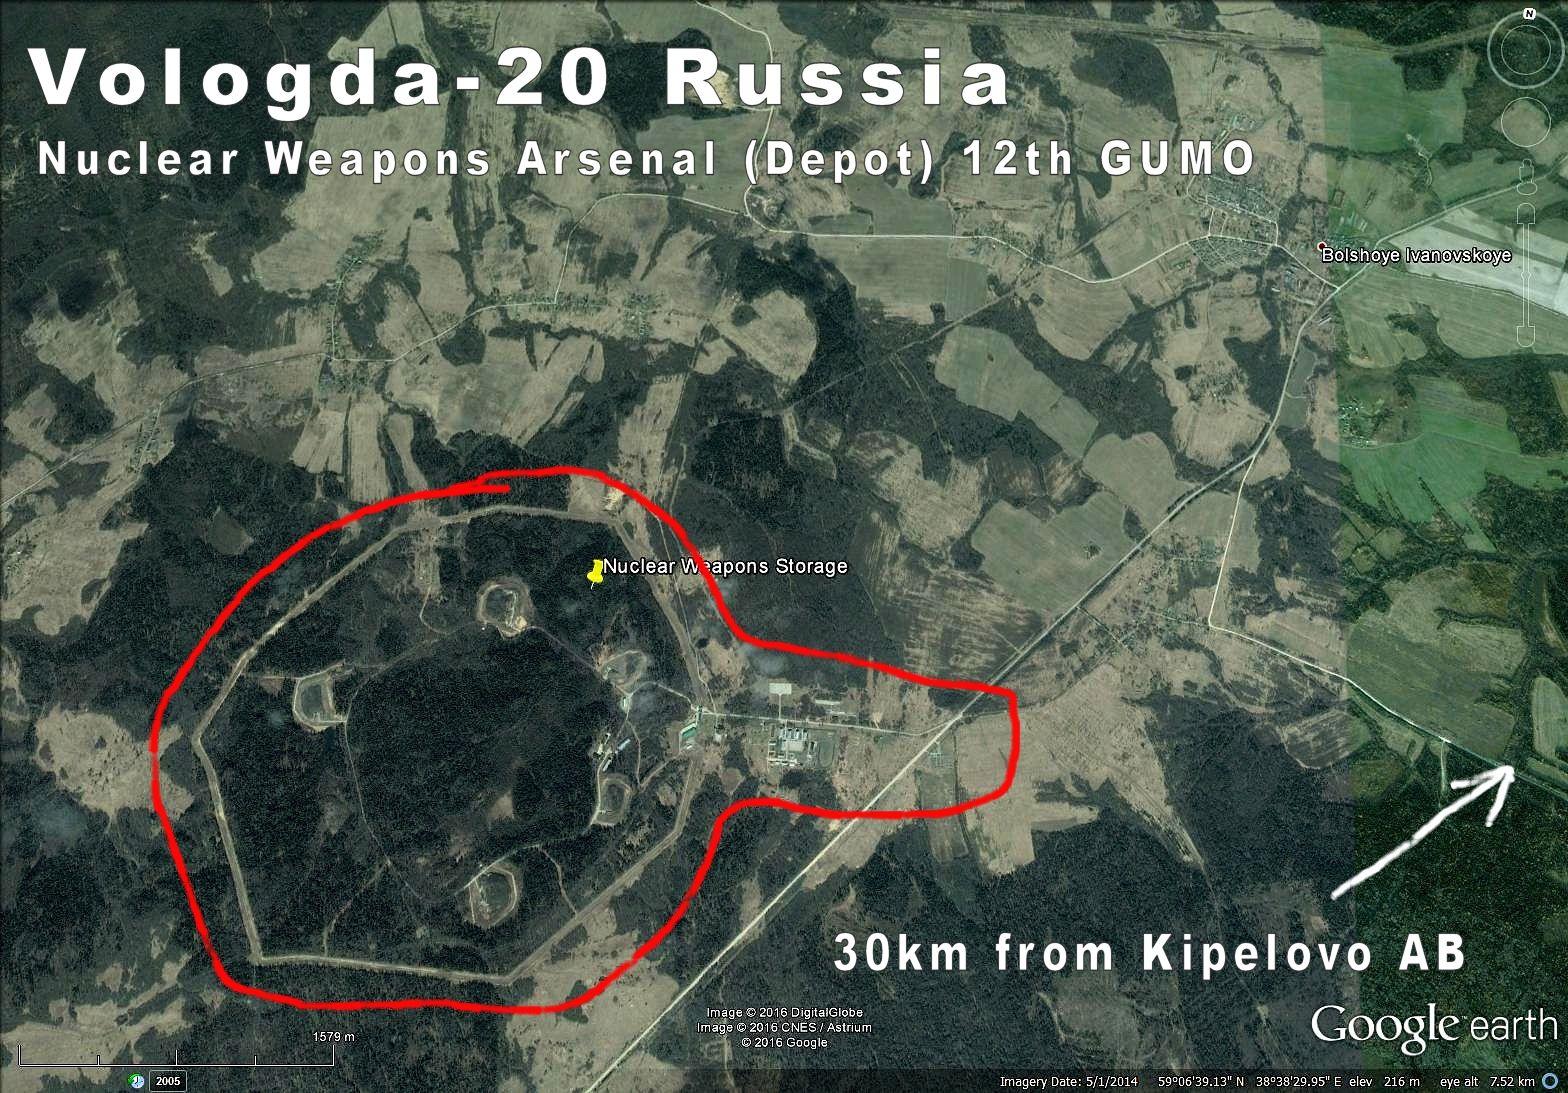 Krasnoyarsk 26 Plutonium Factory in mountain This is